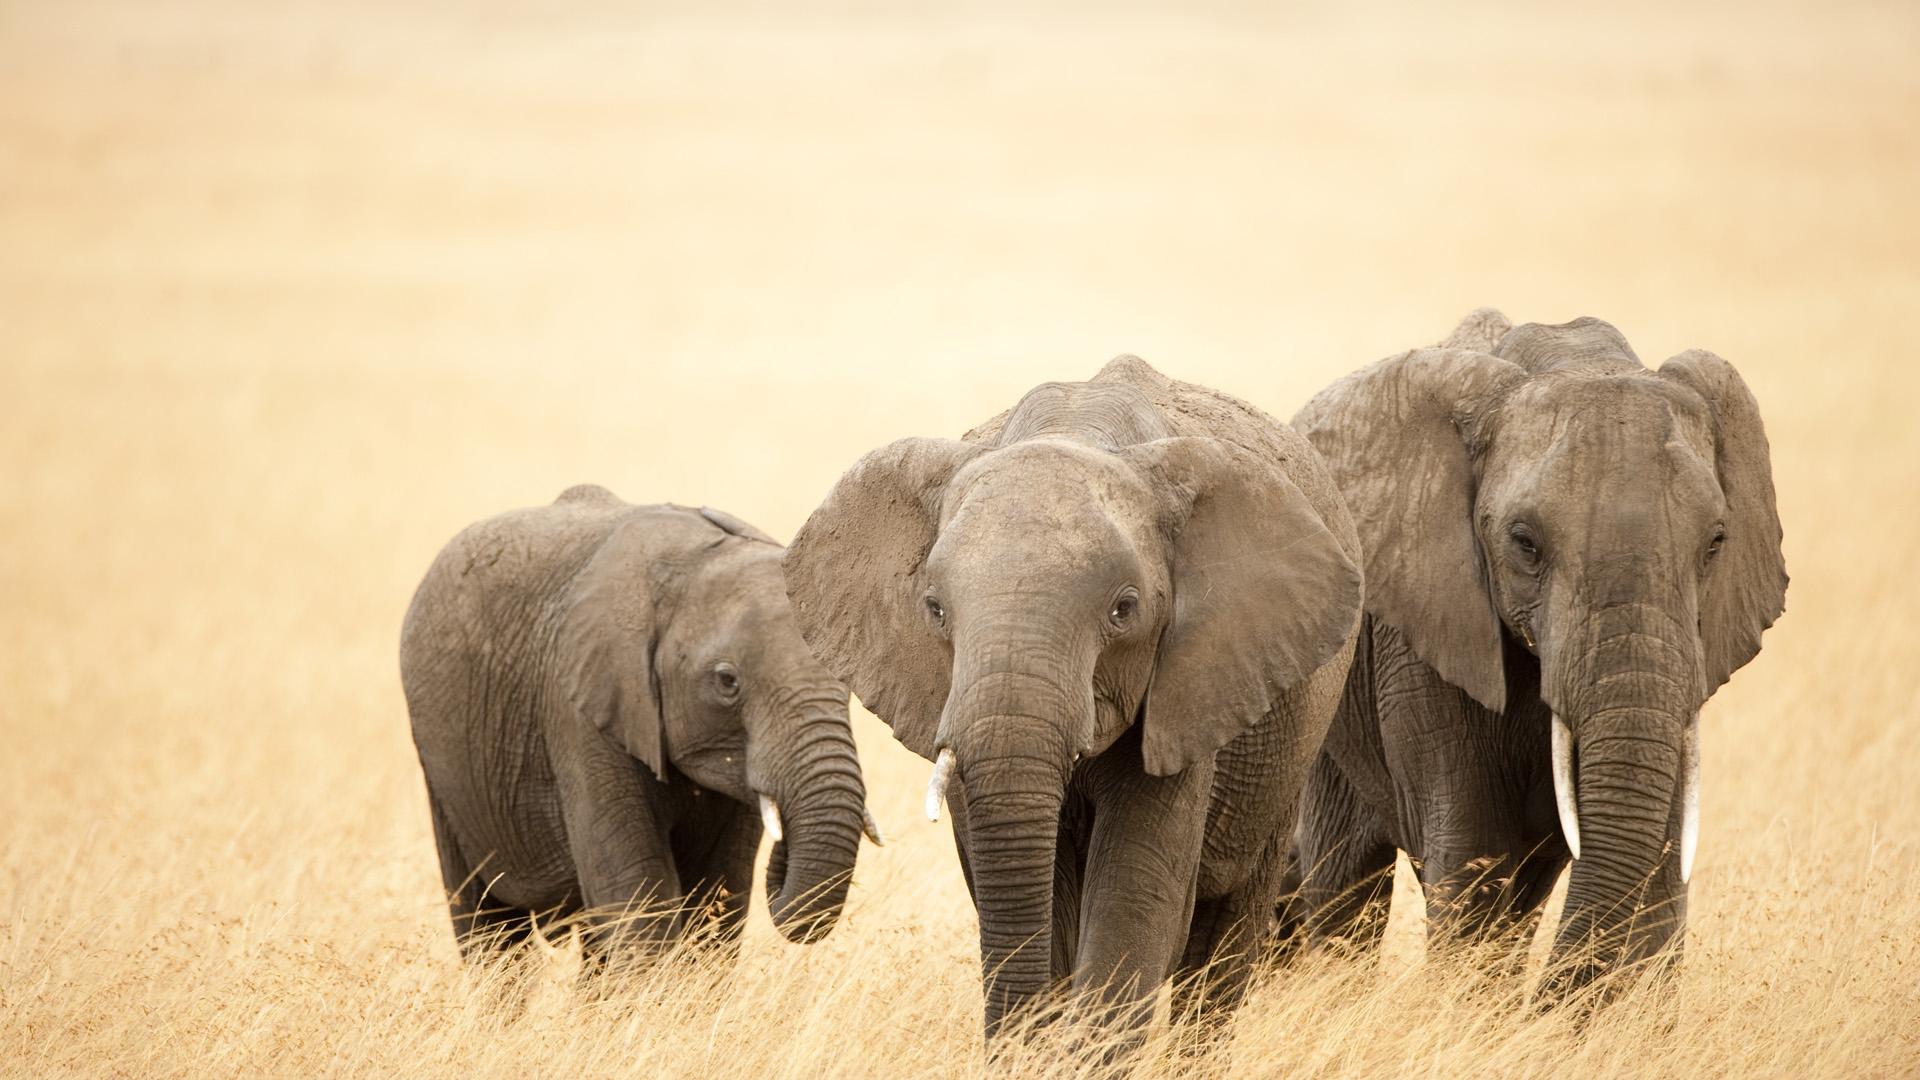 Hd wallpaper elephant - Elephant Art Wallpapers Hd Resolution